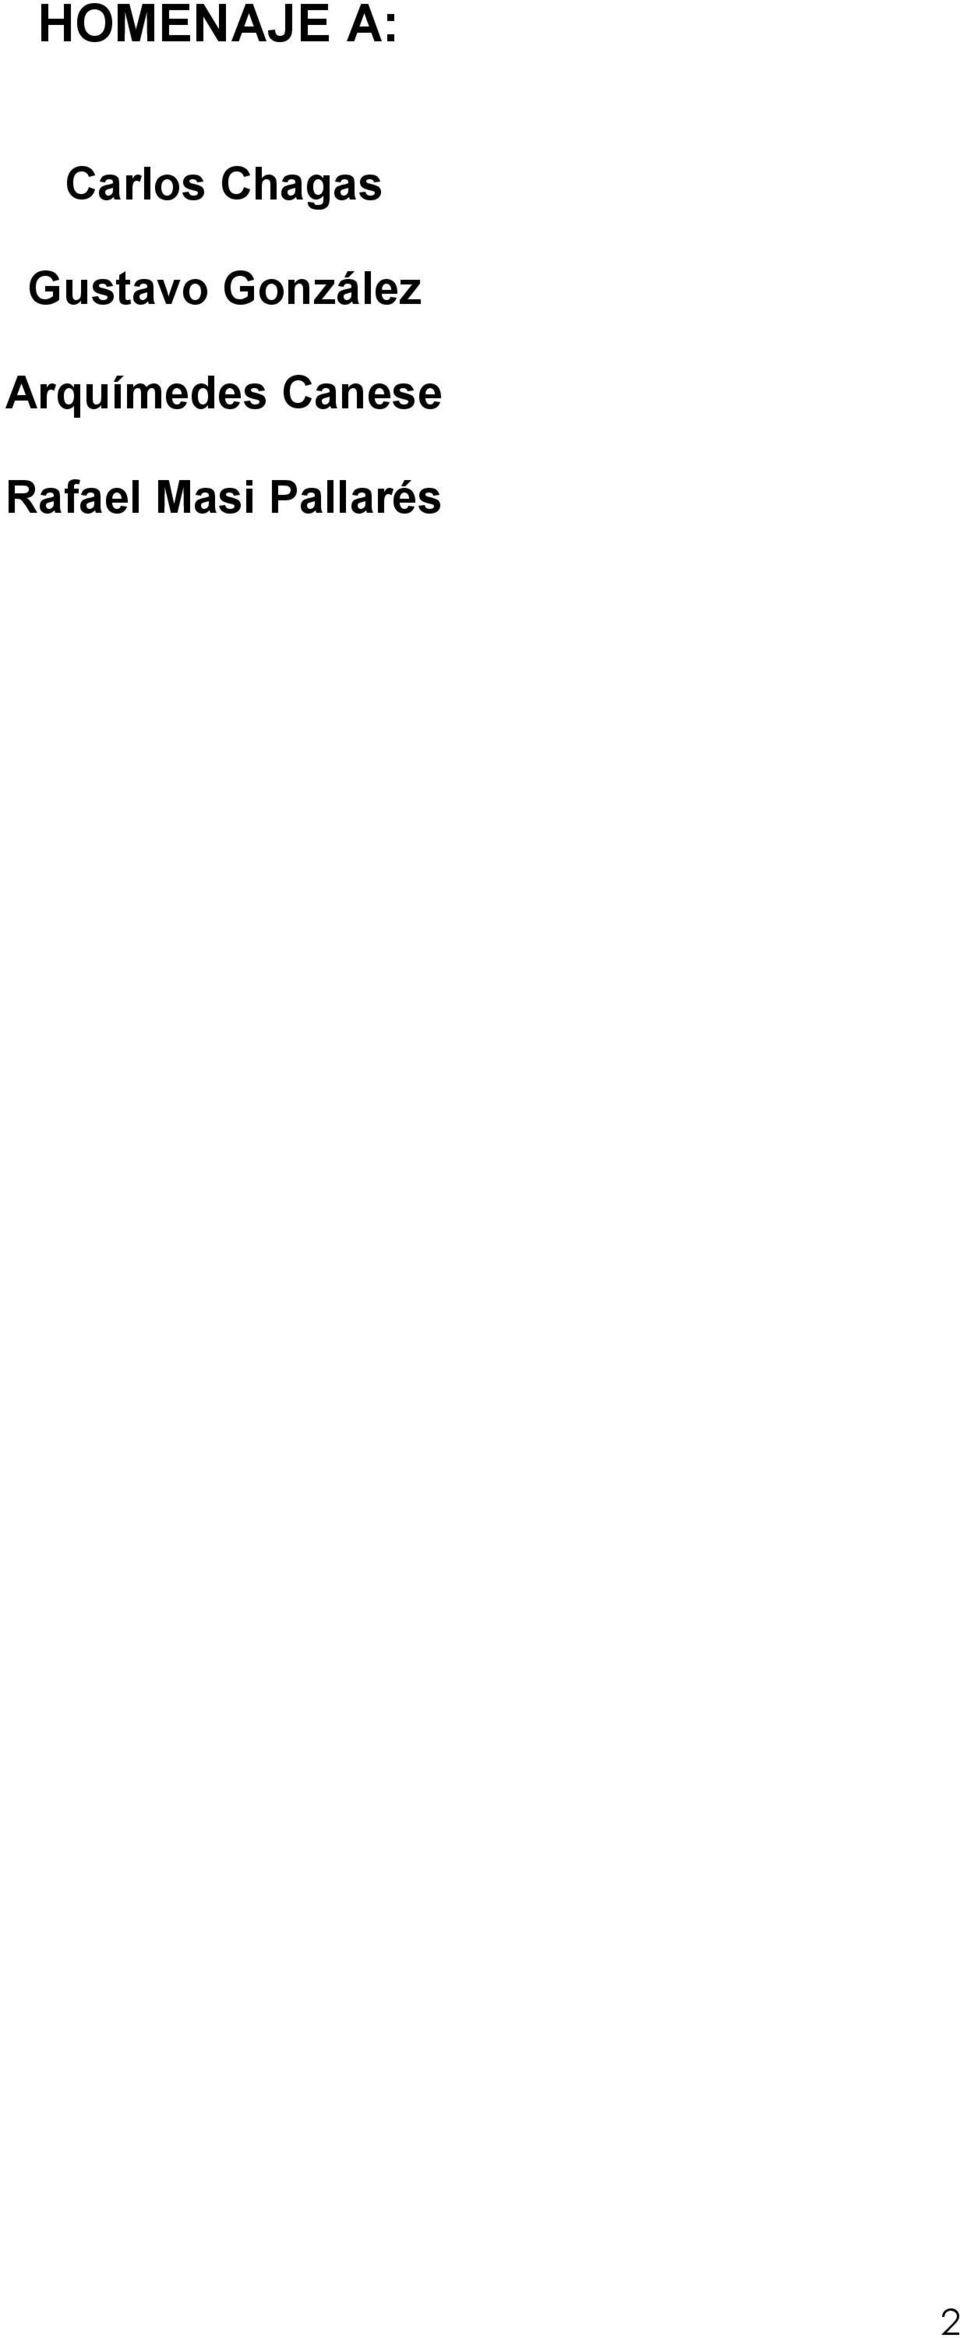 Calendario 2019 Puerto Rico Recientes Xix Congreso Latinoamericano De Parasitologia Pdf Of Calendario 2019 Puerto Rico Más Reciente Ads Gatorade Usain Bolt Cam Newton Derek Jeter